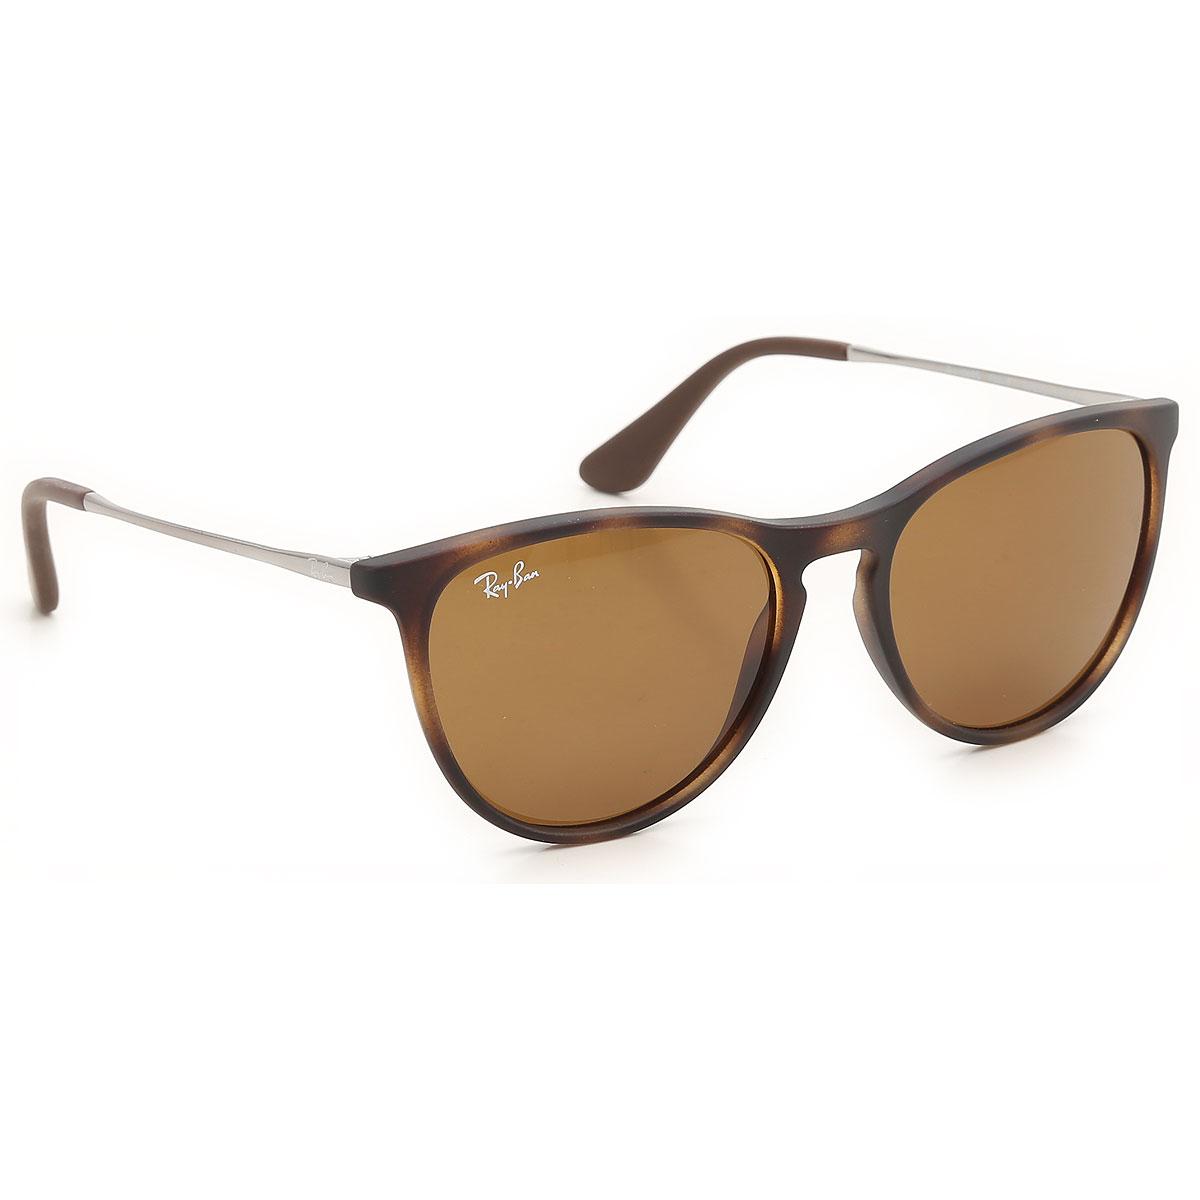 Ray Ban Junior Kids Sunglasses for Girls On Sale, Matt Havana, 2017 USA-407267